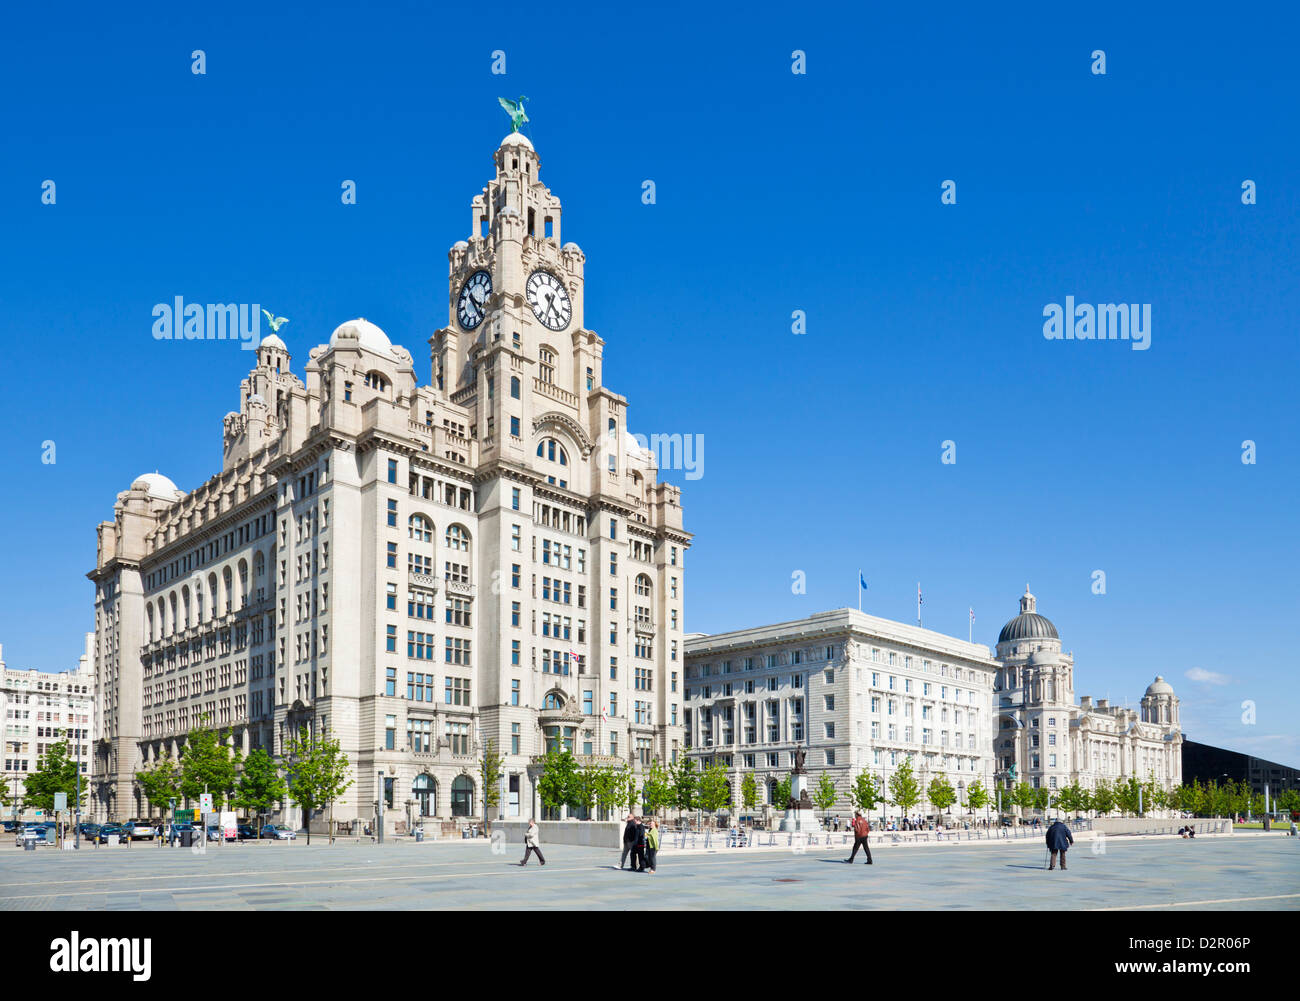 Three Graces buildings, Pierhead, Liverpool waterfront, Liverpool, Merseyside, England, UK - Stock Image